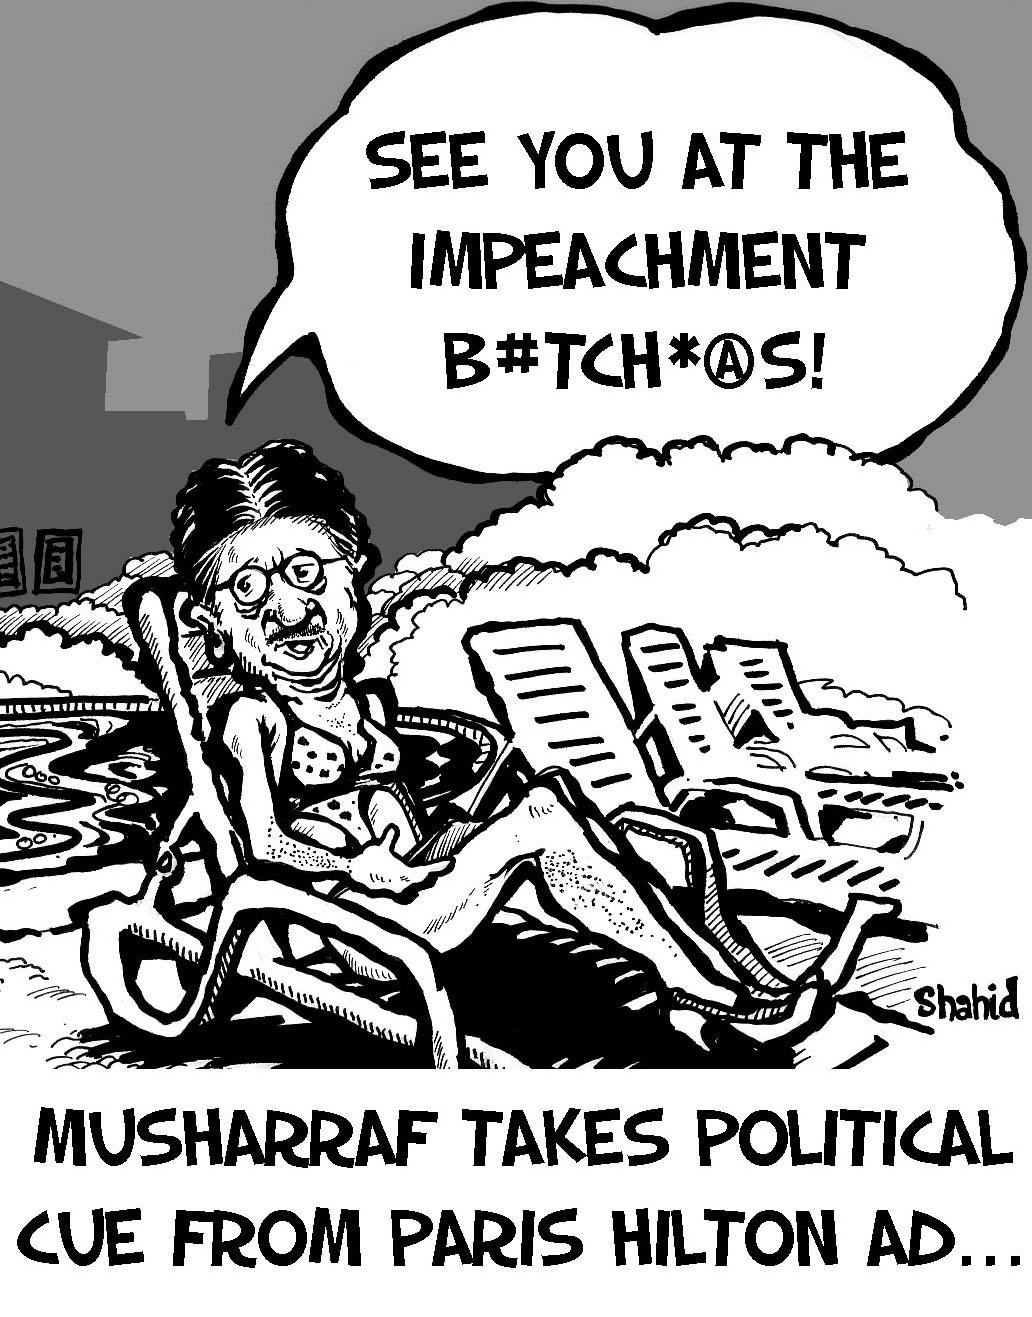 2008-08-14-shahids_cartoons-MusharrafImpeachment_HuffAug72008.jpg